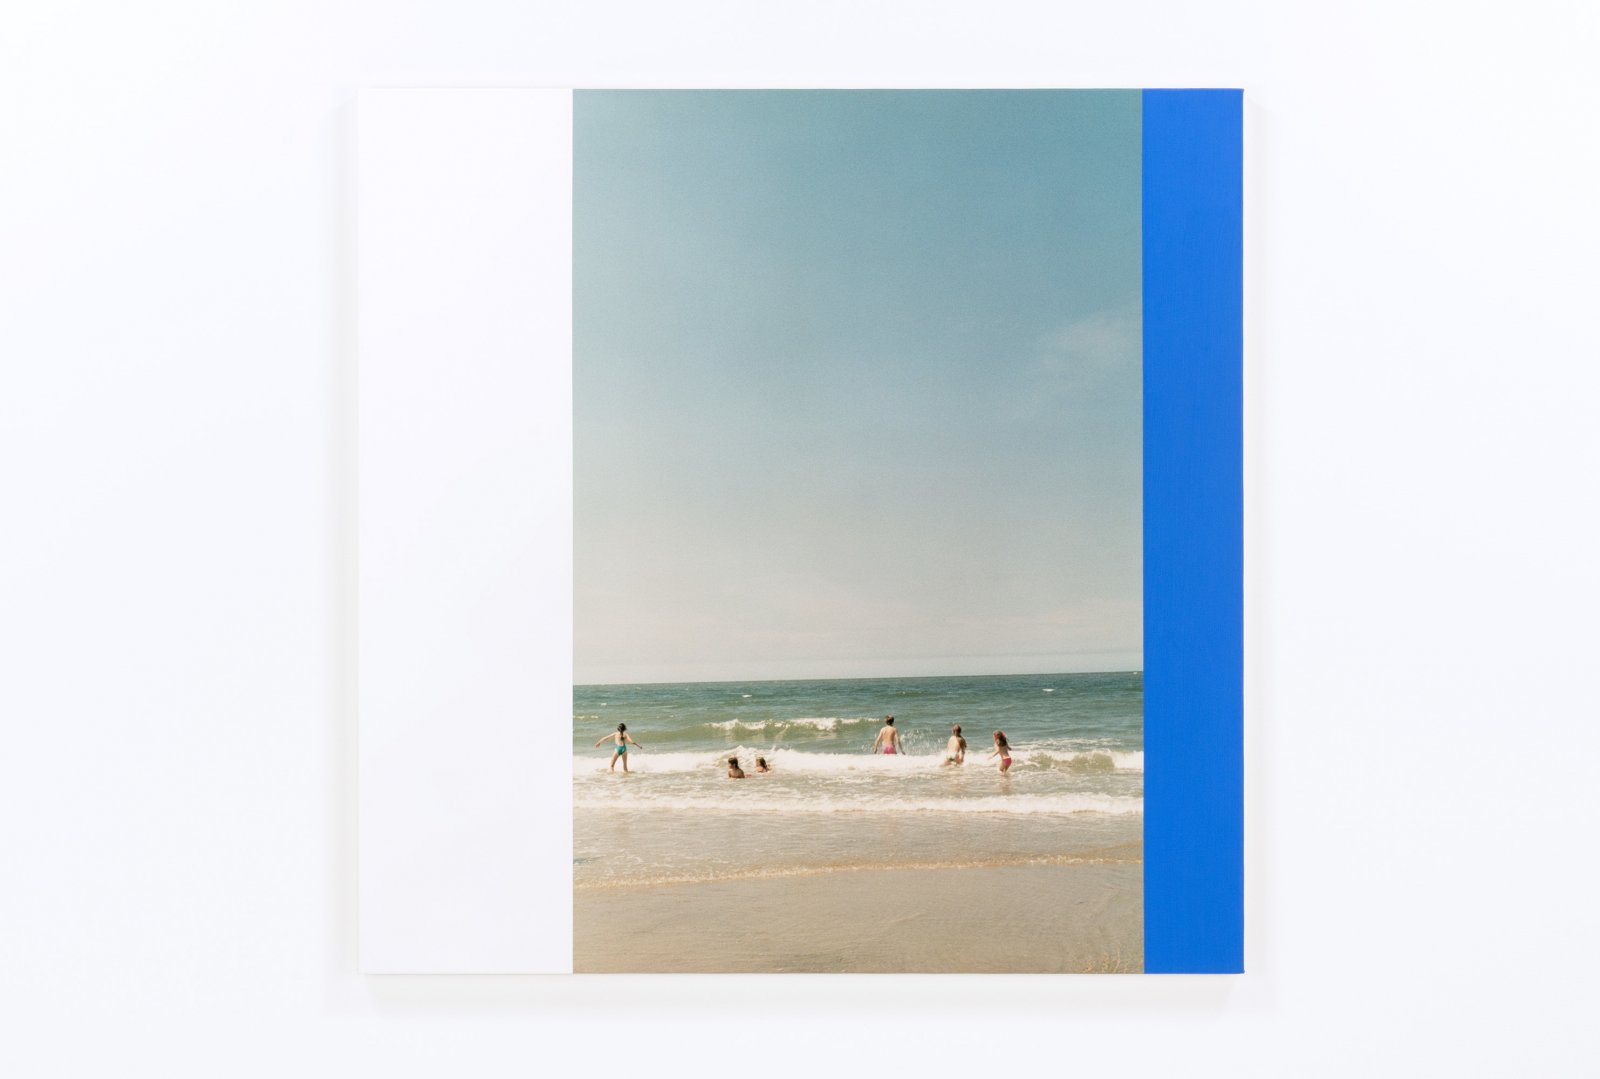 Ian Wallace,Hommage a Mondrian XVI(Beach at Domburg III), 1990, photolaminate and acrylic on canvas, 48 x 48 in. (122 x 122 cm)